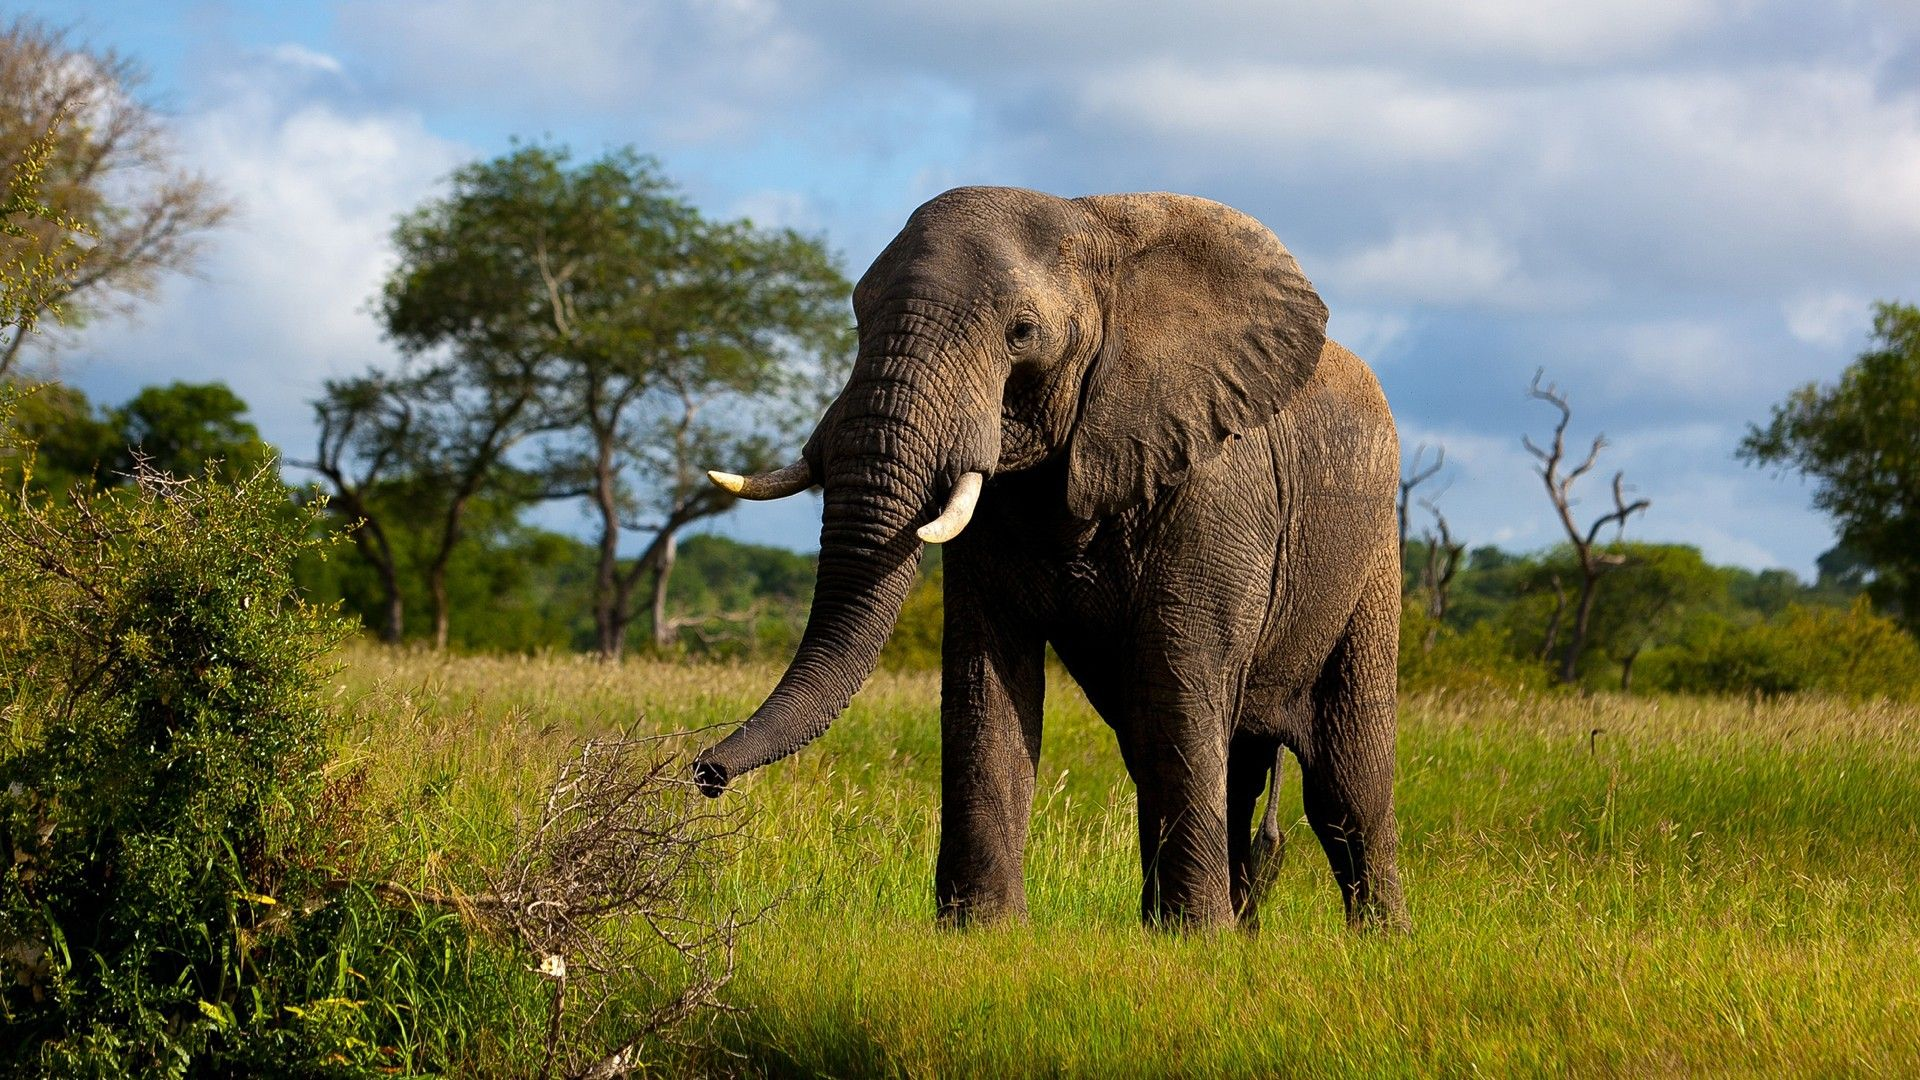 Hd wallpaper elephant - Elephant Hd Wallpapers Free Download